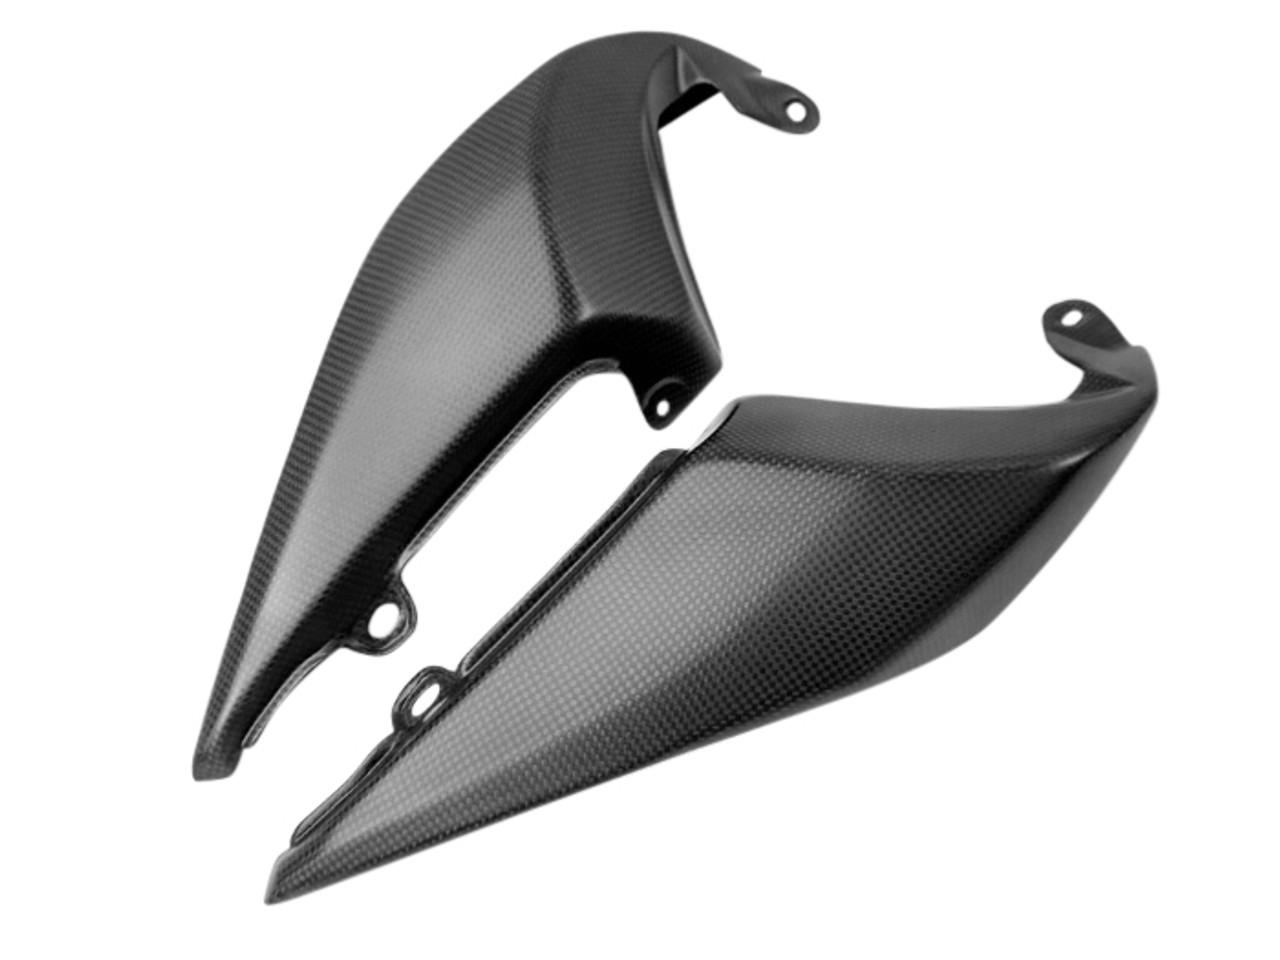 Tail Side Fairings in Matte Plain Weave Carbon Fiber for Triumph Speed Triple 1050R 2016+